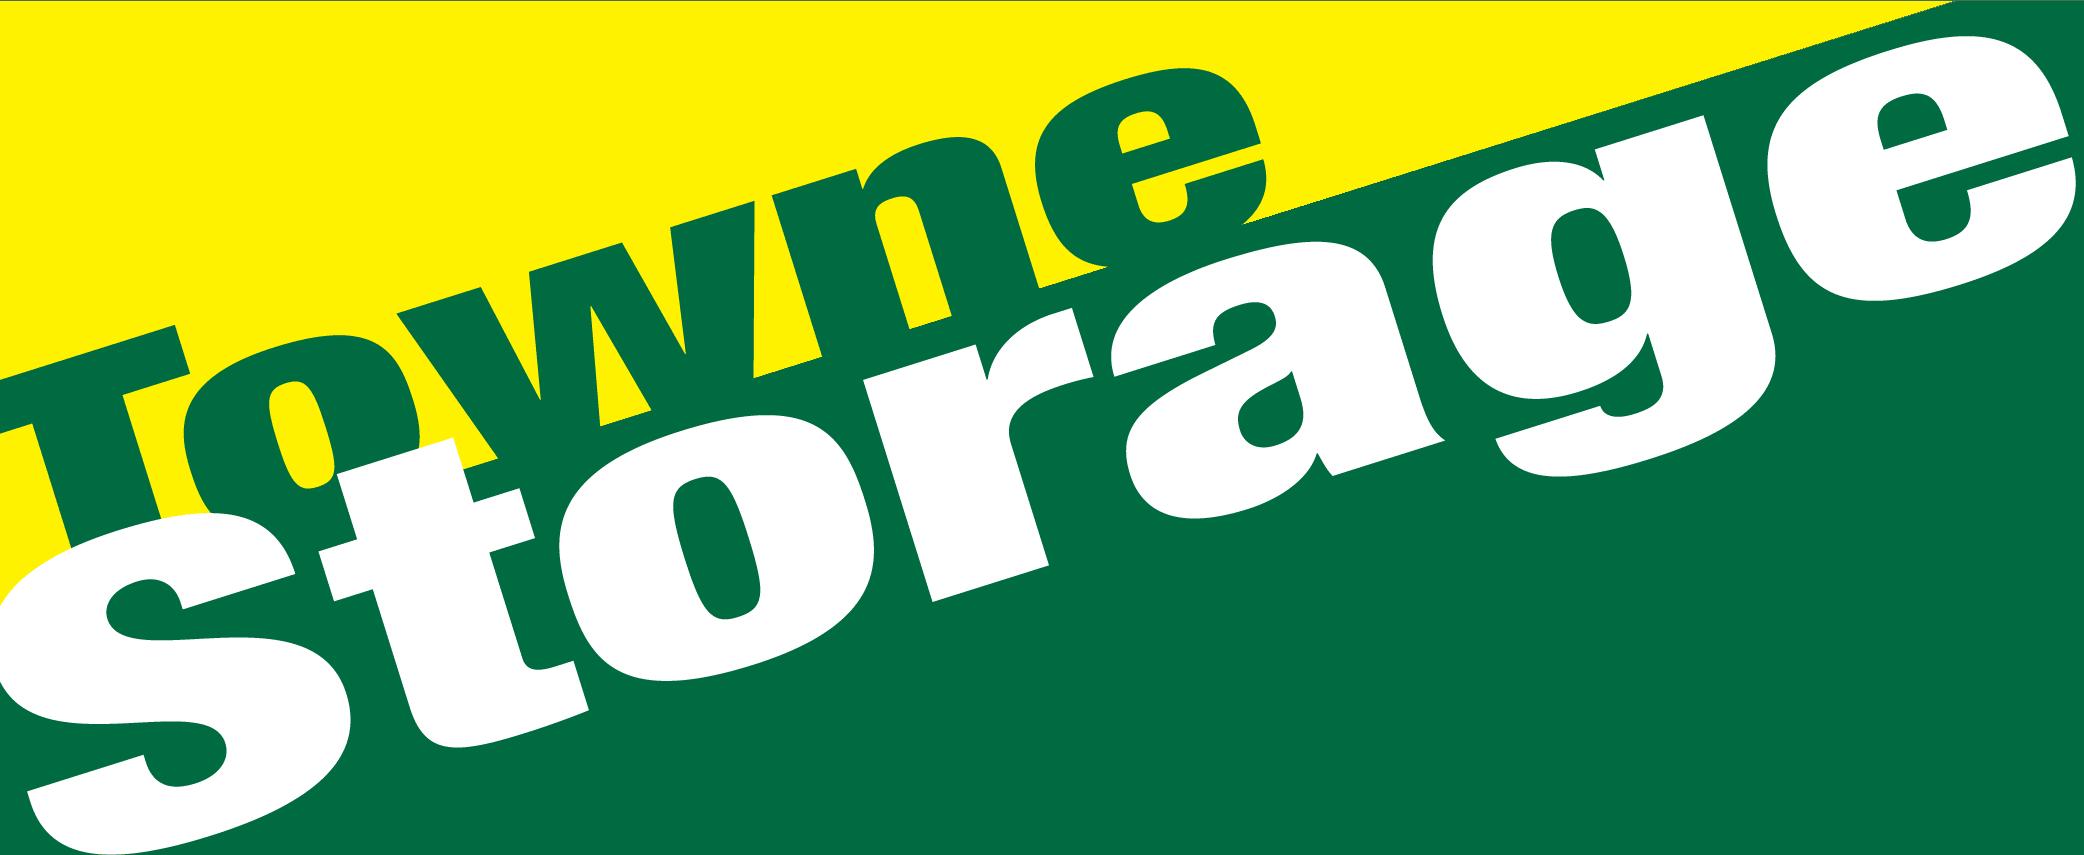 Towne Storage - Union Park logo